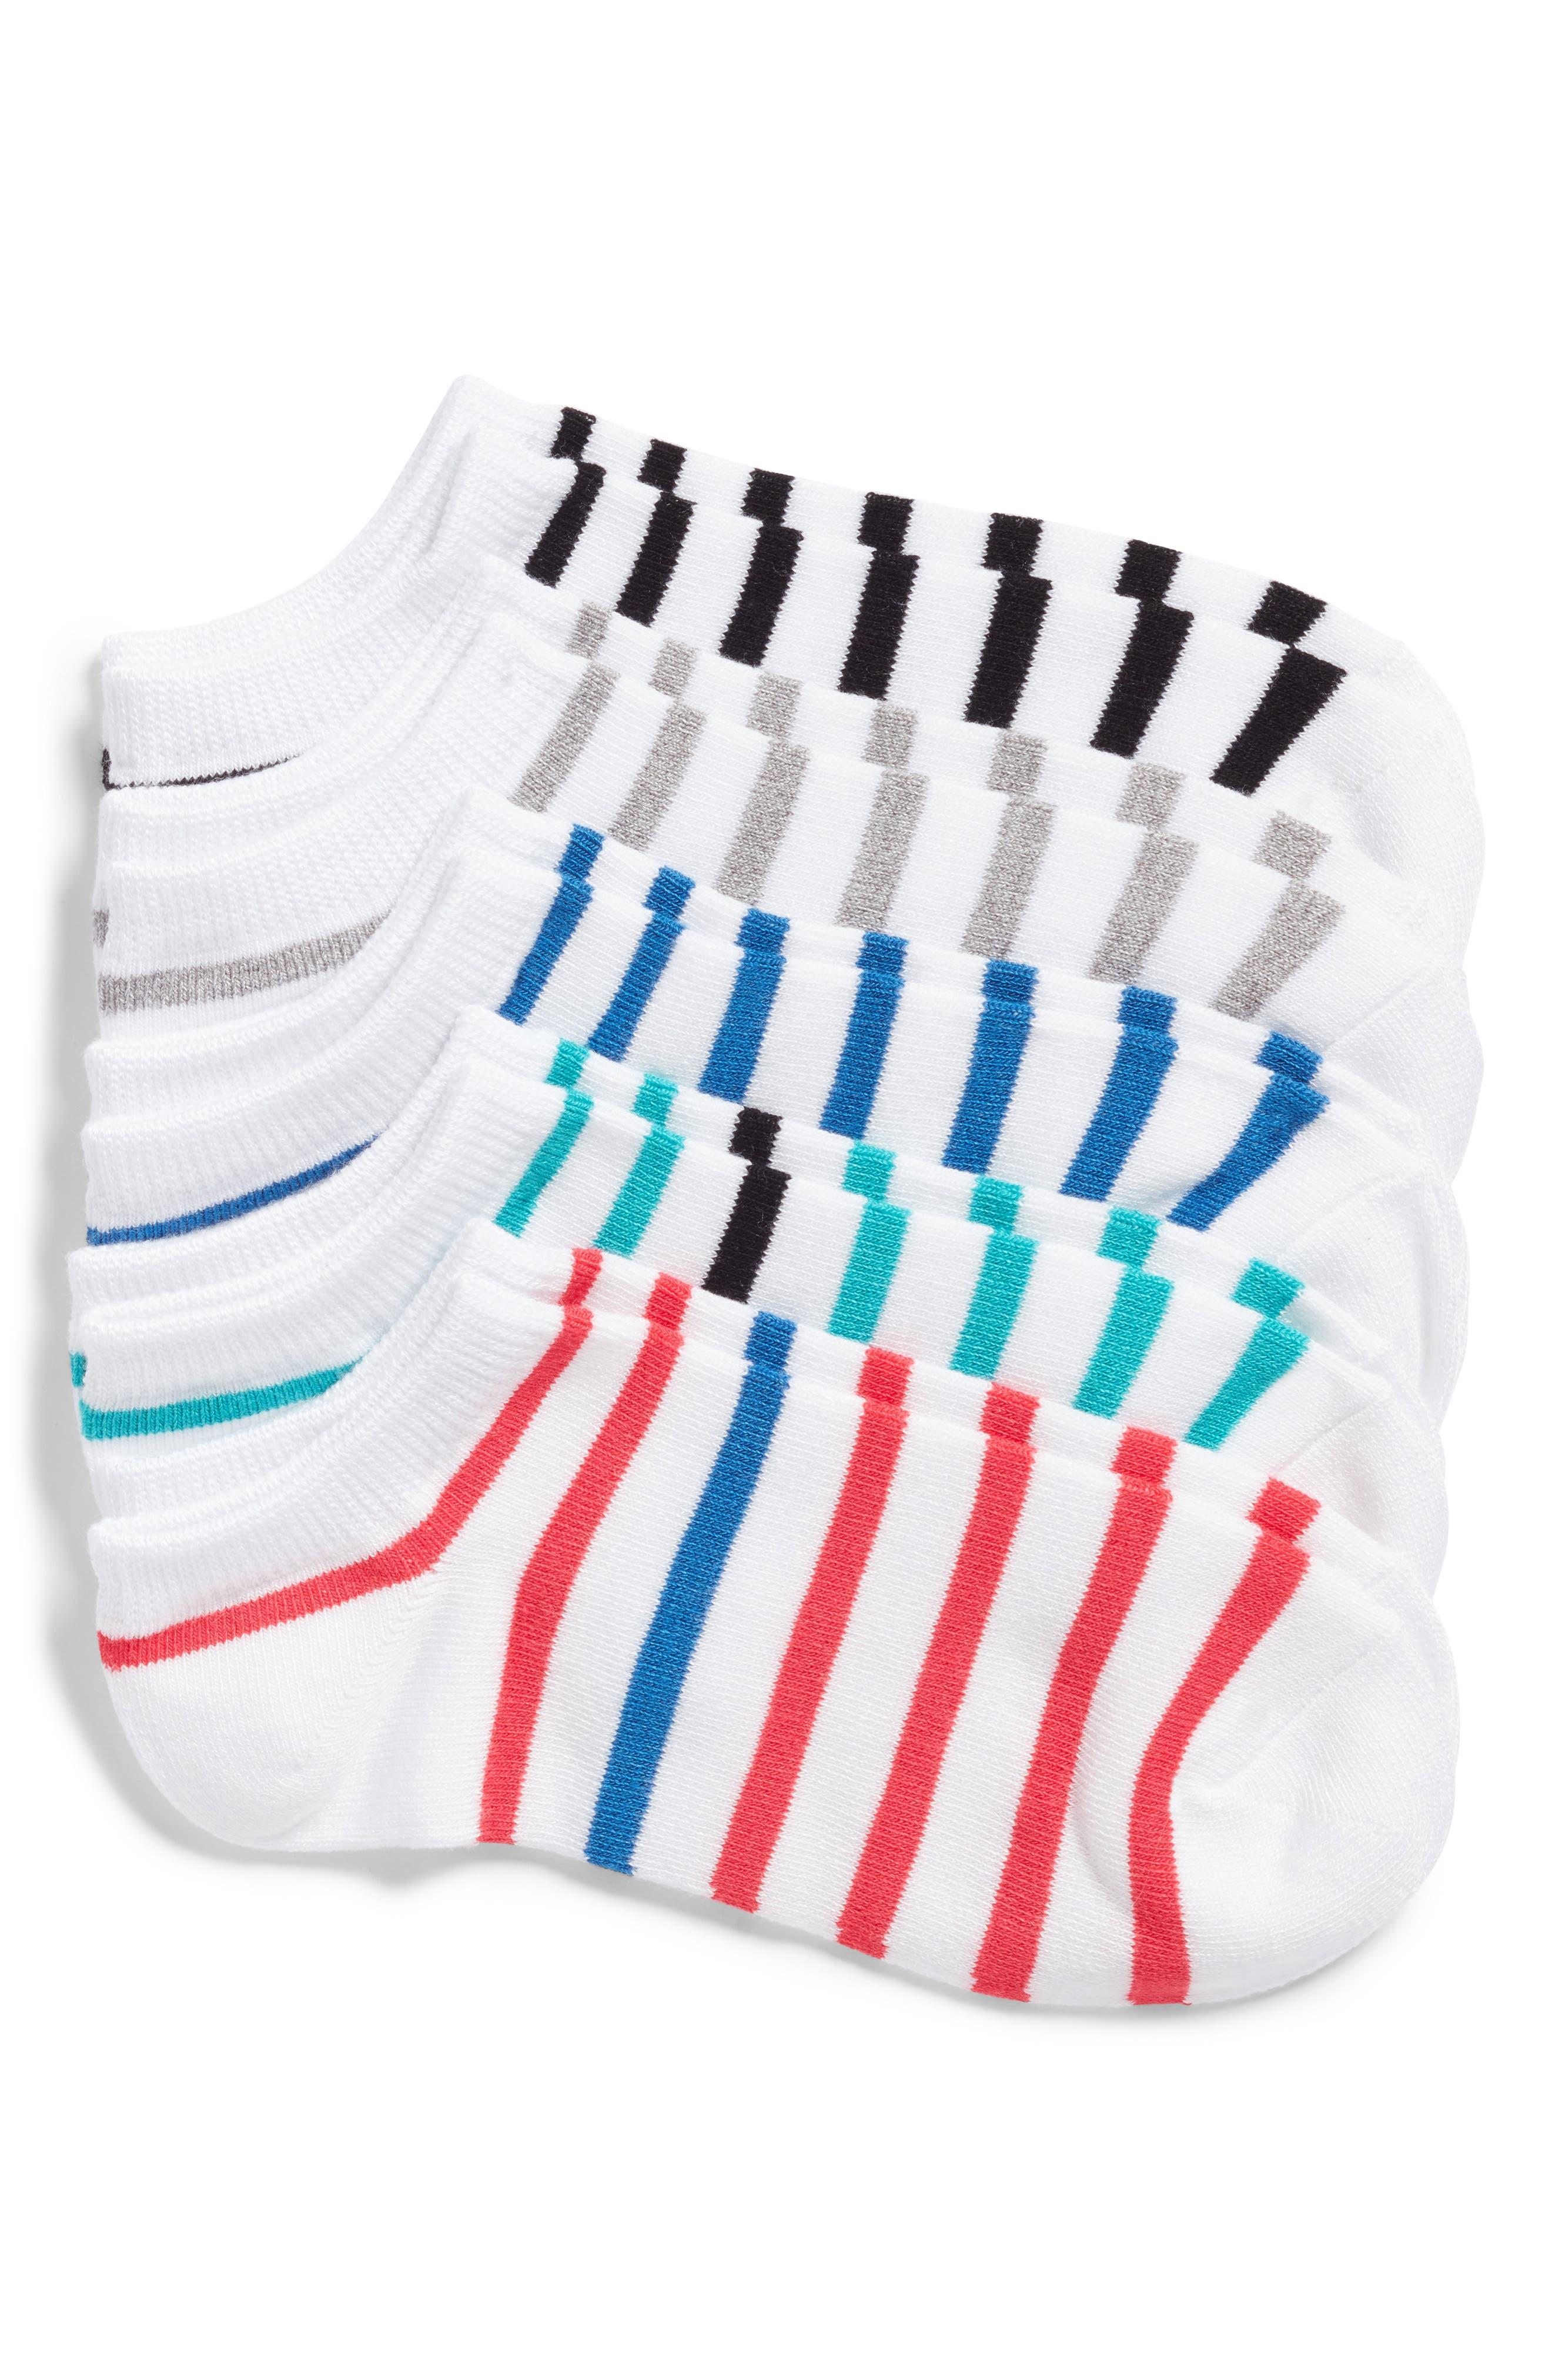 5-Pack Breton Stripe Socks,                             Main thumbnail 1, color,                             White